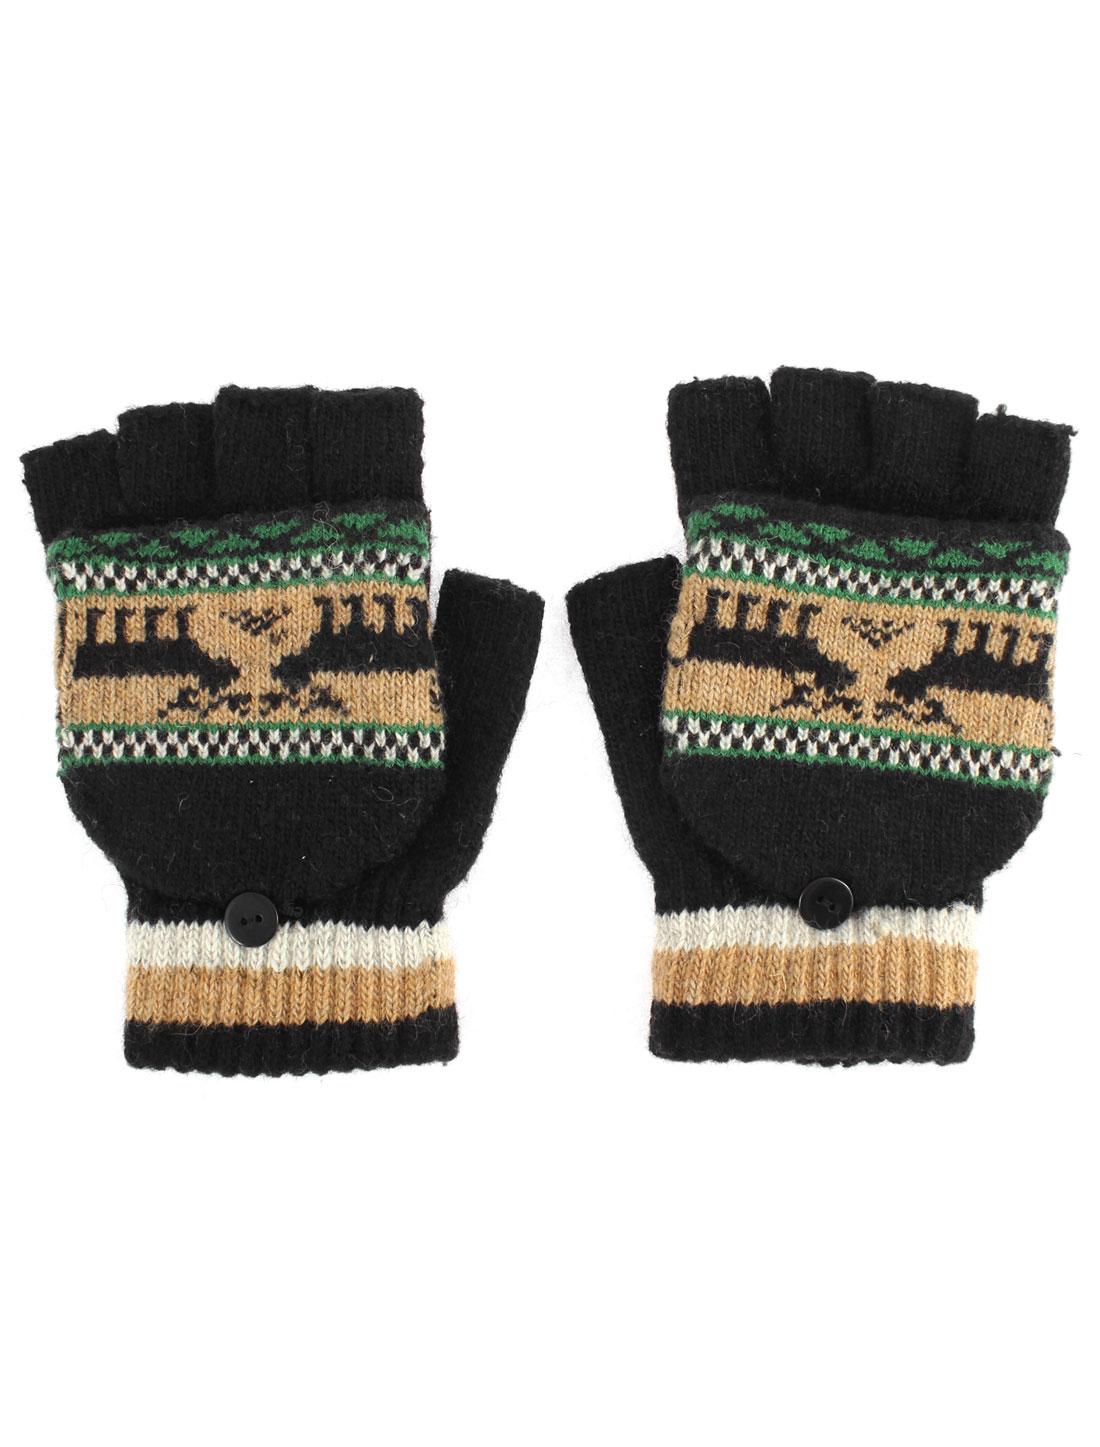 Unisex Deer Pattern Flip Convertible Half-finger Knitted Gloves Black Pair